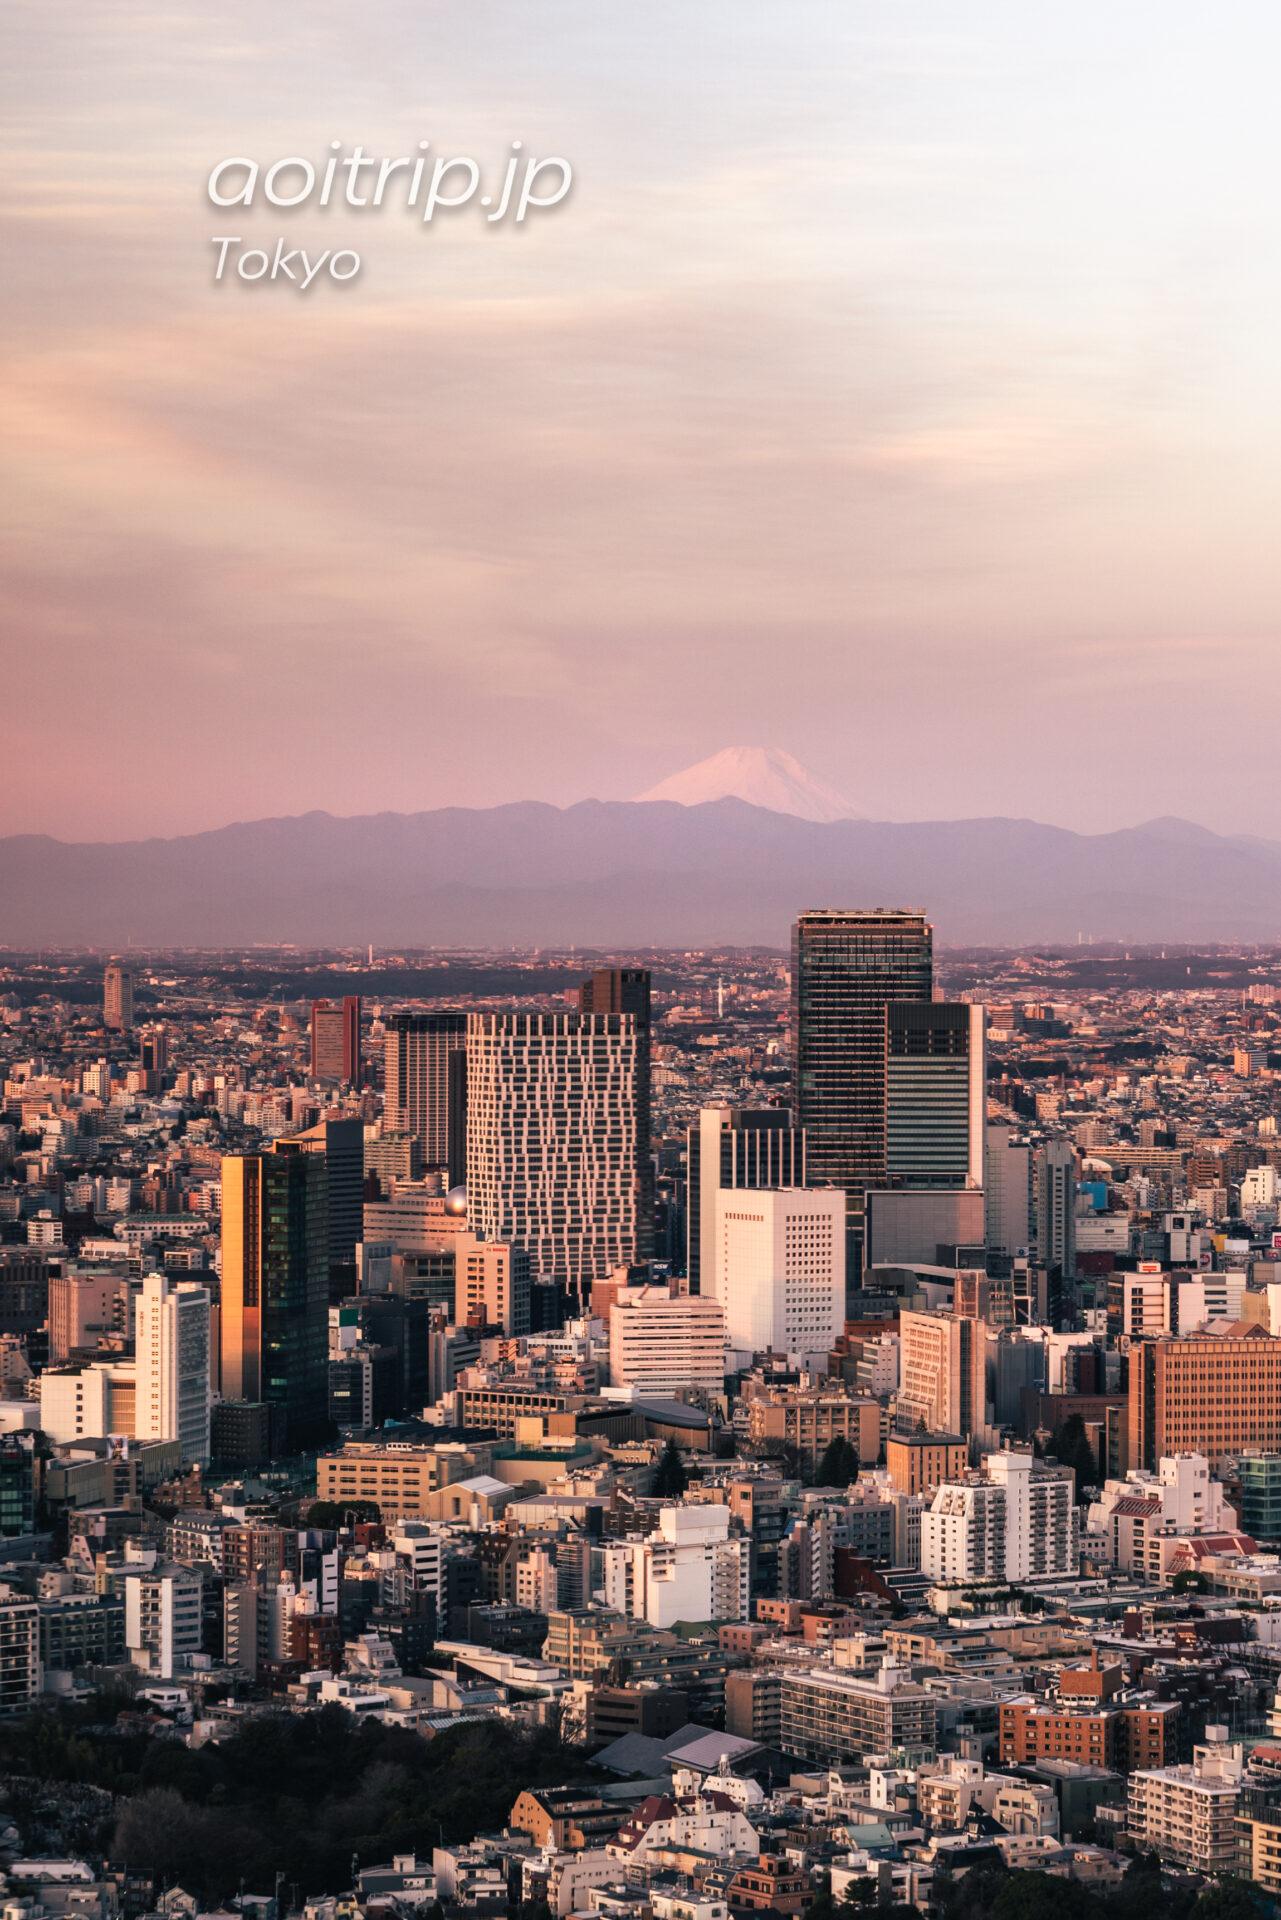 Tokyo Skyline ザ リッツカールトン東京から望む富士山